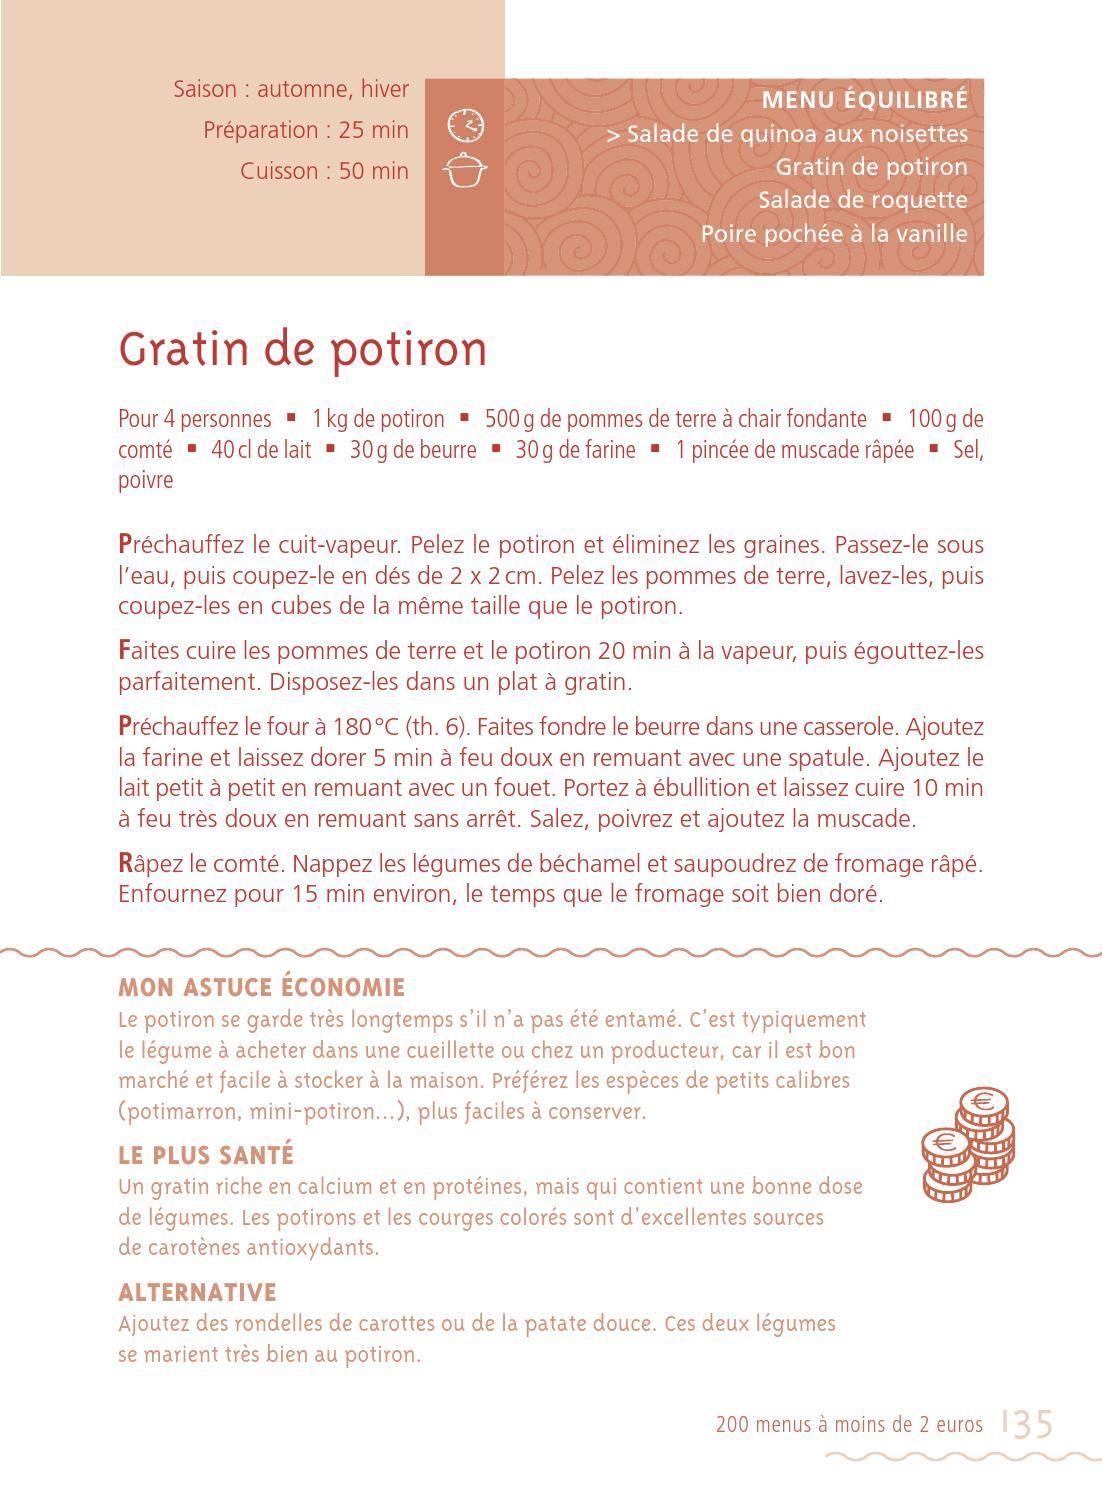 200 Menus équilibrés à 2 Euros : menus, équilibrés, euros, Menus, Equilibres, Bernard, Carrascosa, Issuu